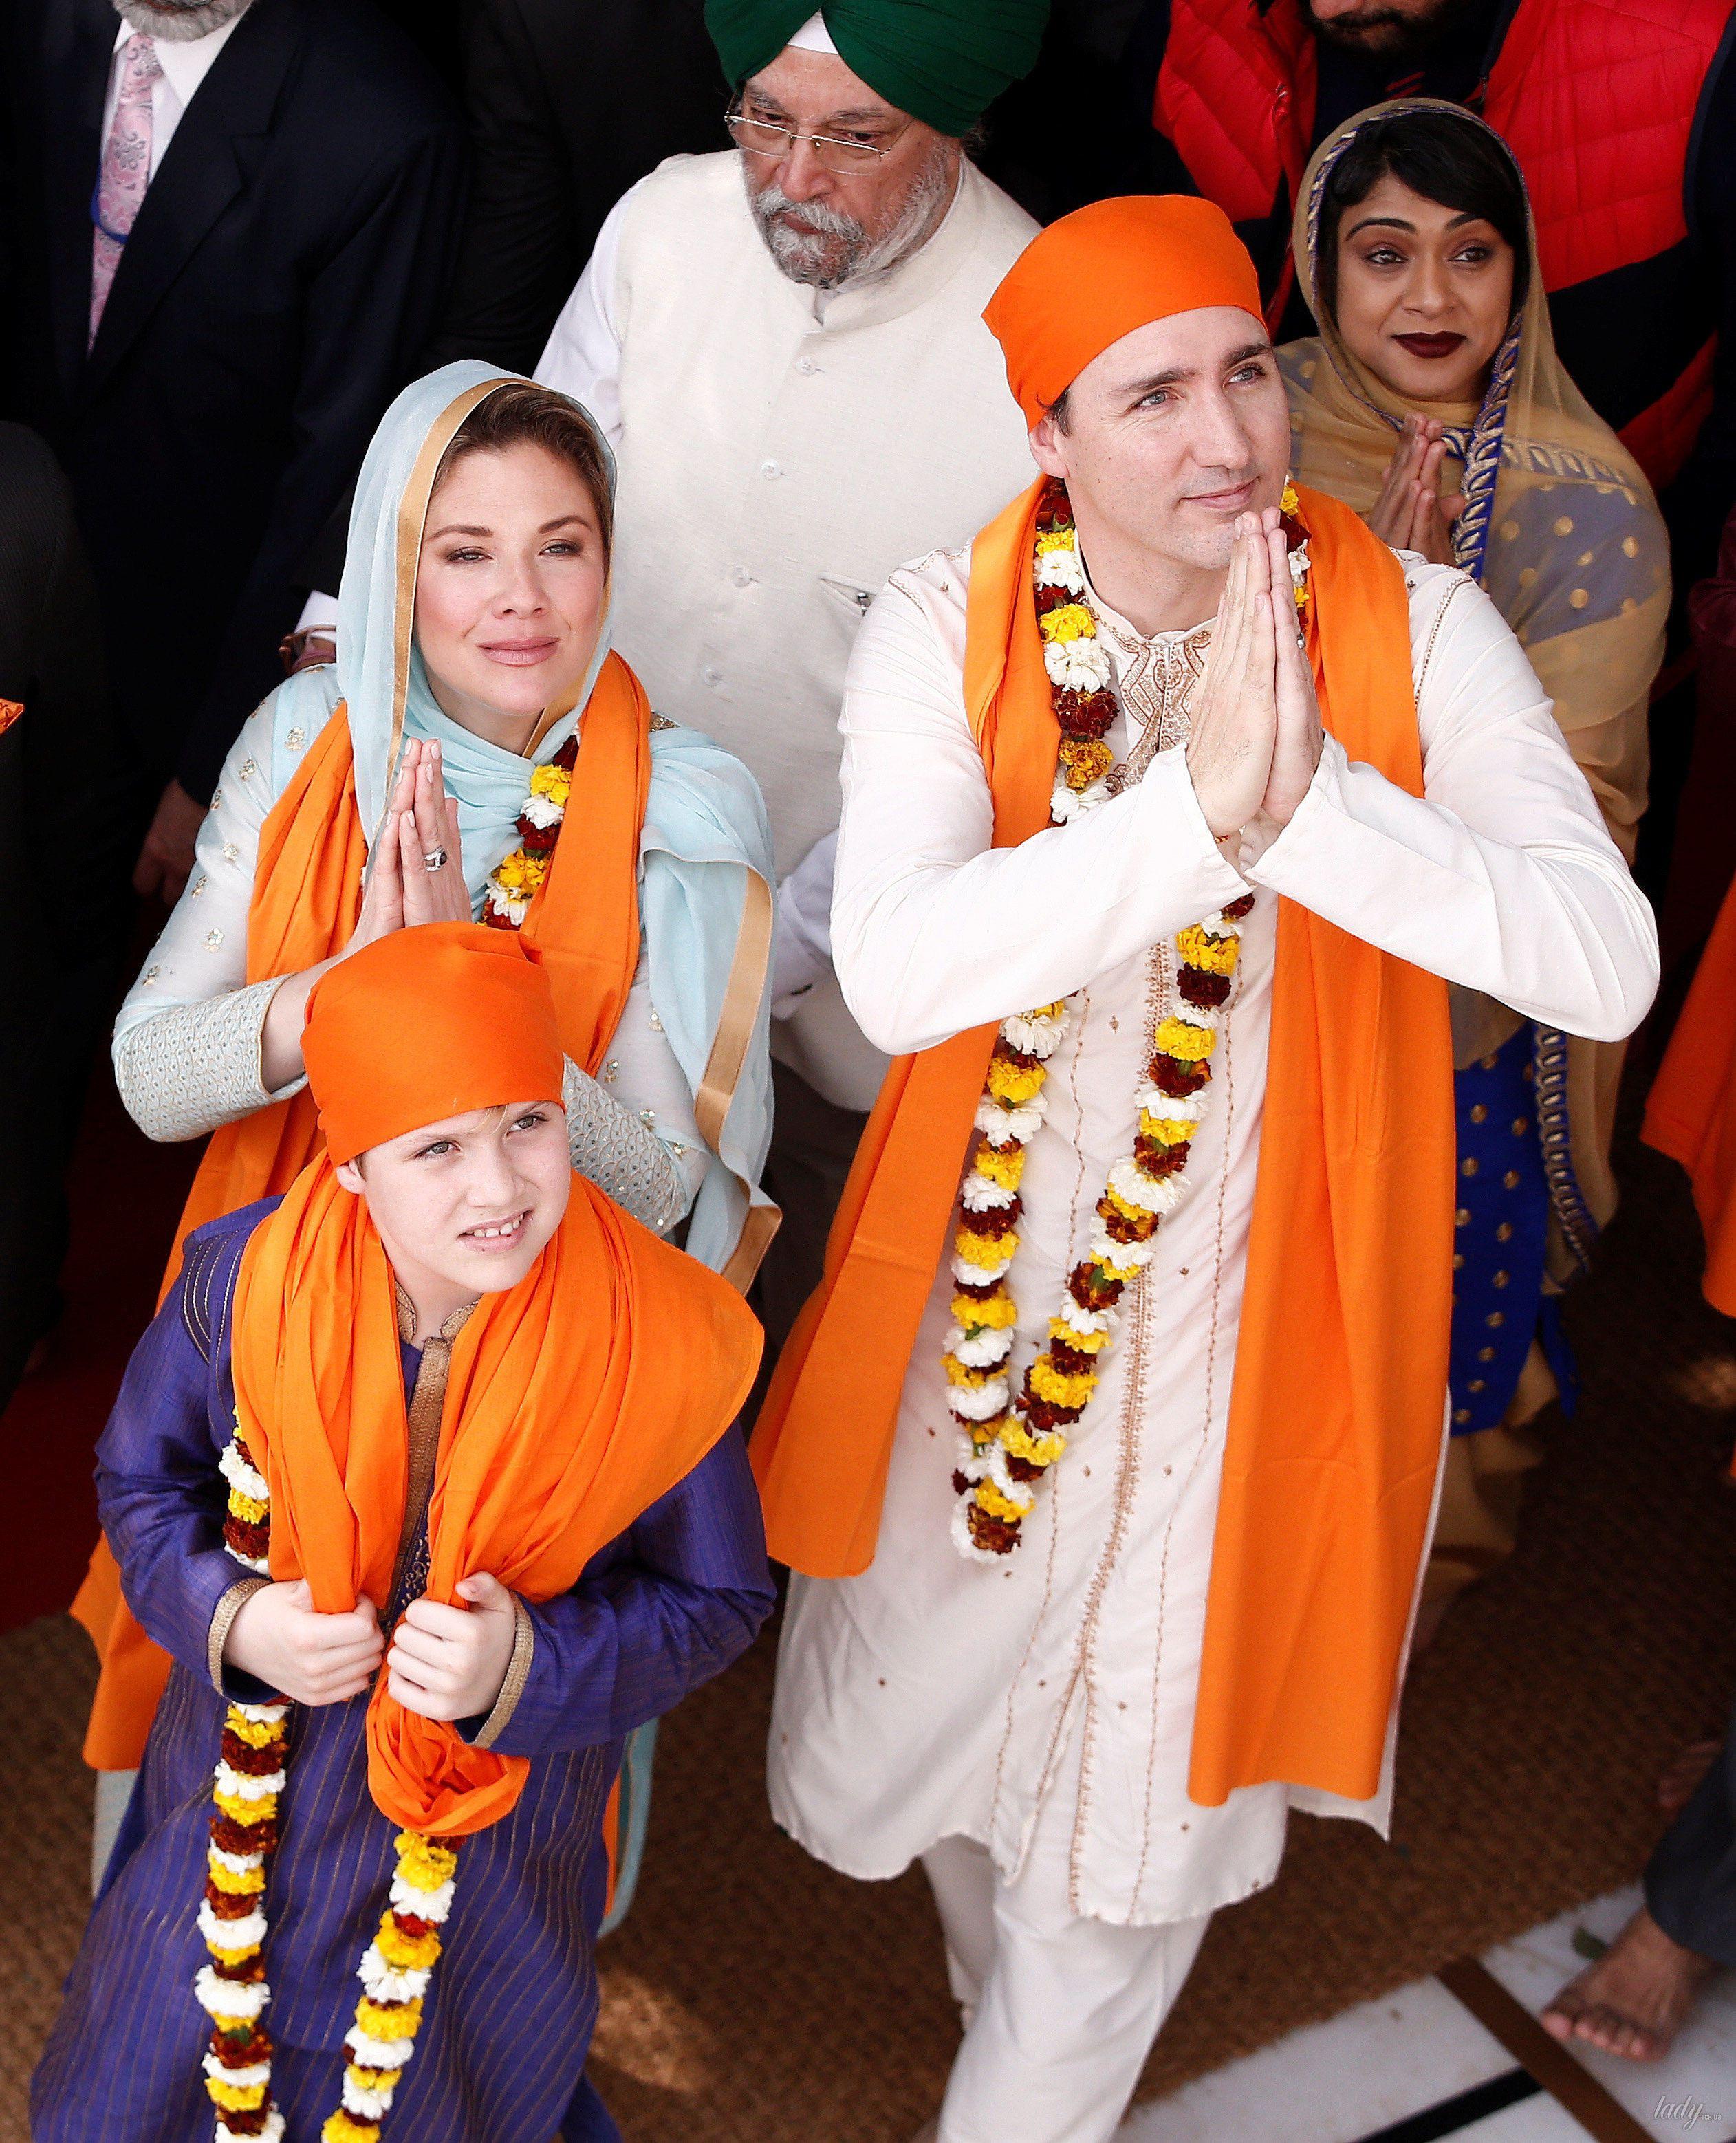 Премьер-министр Канады Джастин Трюдо, его жена Софи Грегуар, дочь Элла Грейс и сын Ксавье_2